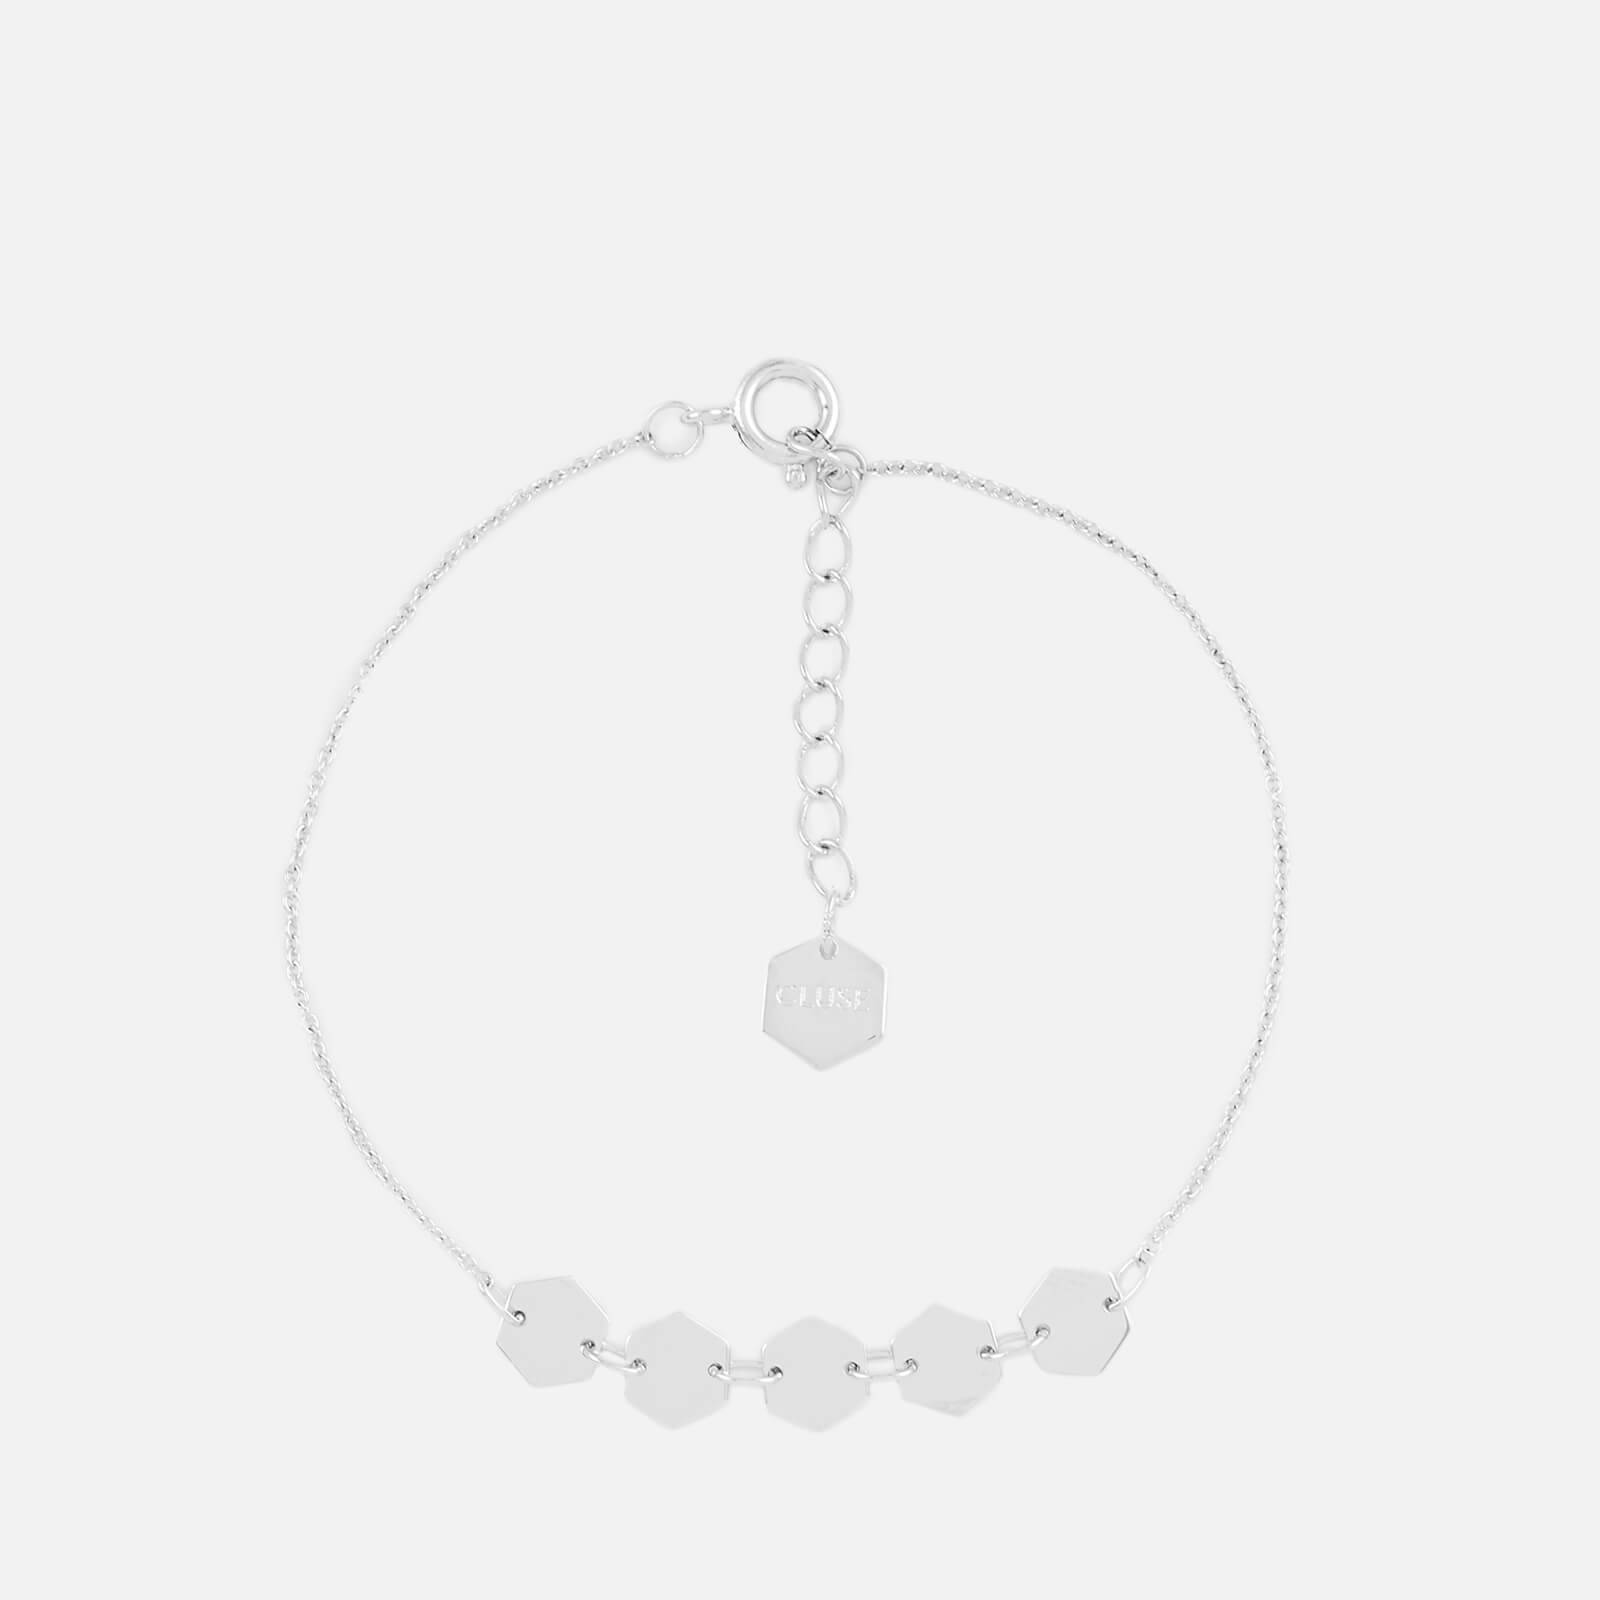 Cluse Women's Essentielle Hexagons Chain Bracelet - Silver